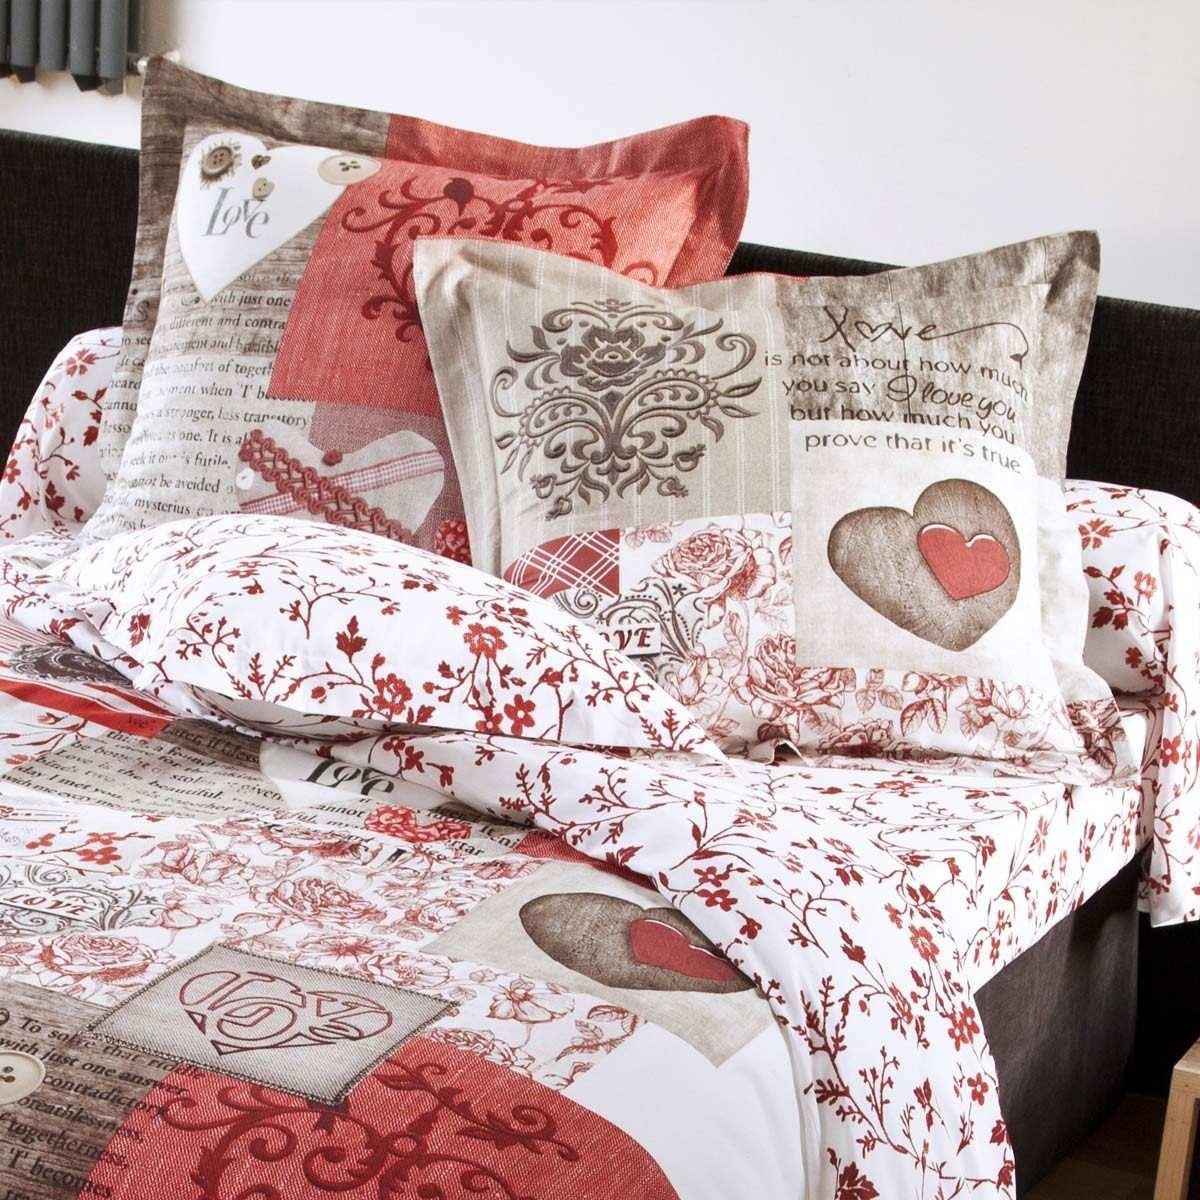 taie oreiller meribel linge de lit de qualit tradition des vosges. Black Bedroom Furniture Sets. Home Design Ideas